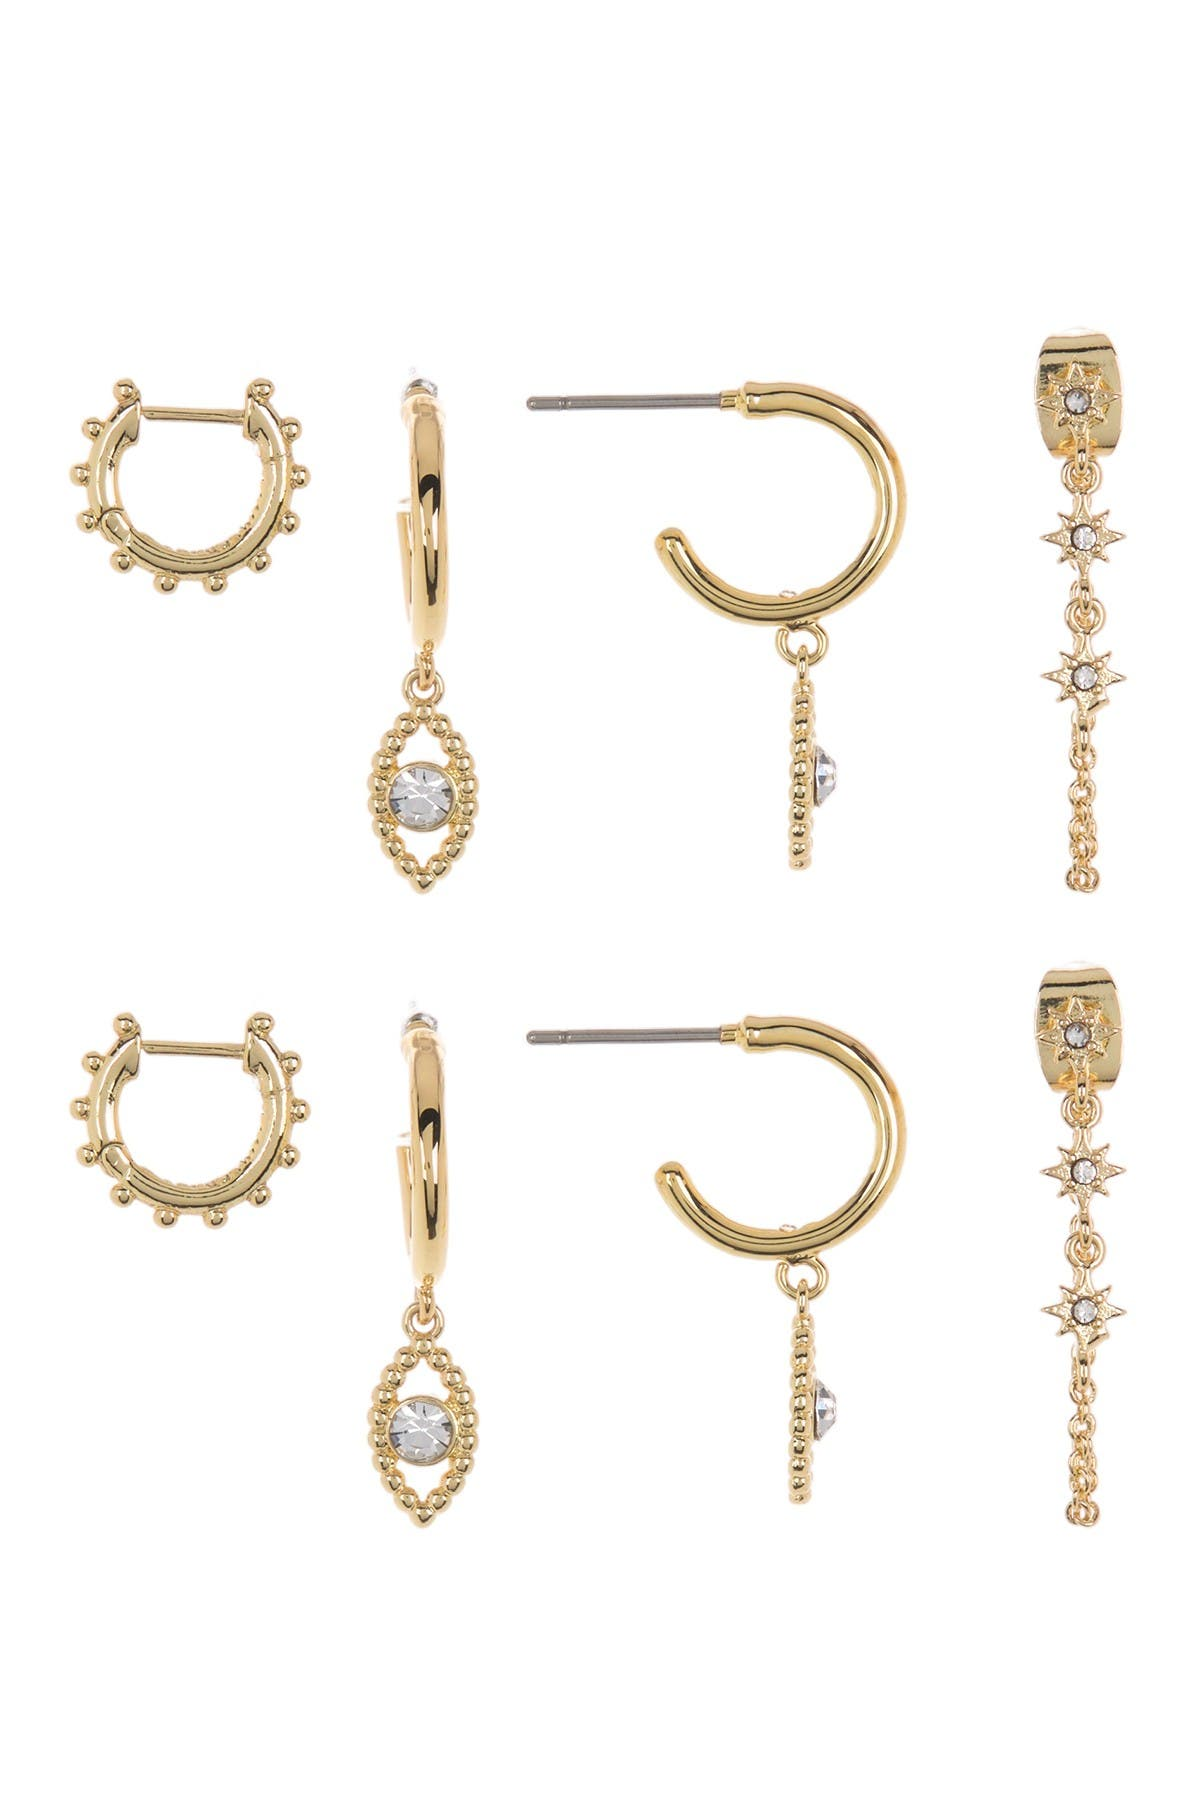 Image of BAUBLEBAR Delicate Trio Stud Earring Gift Set